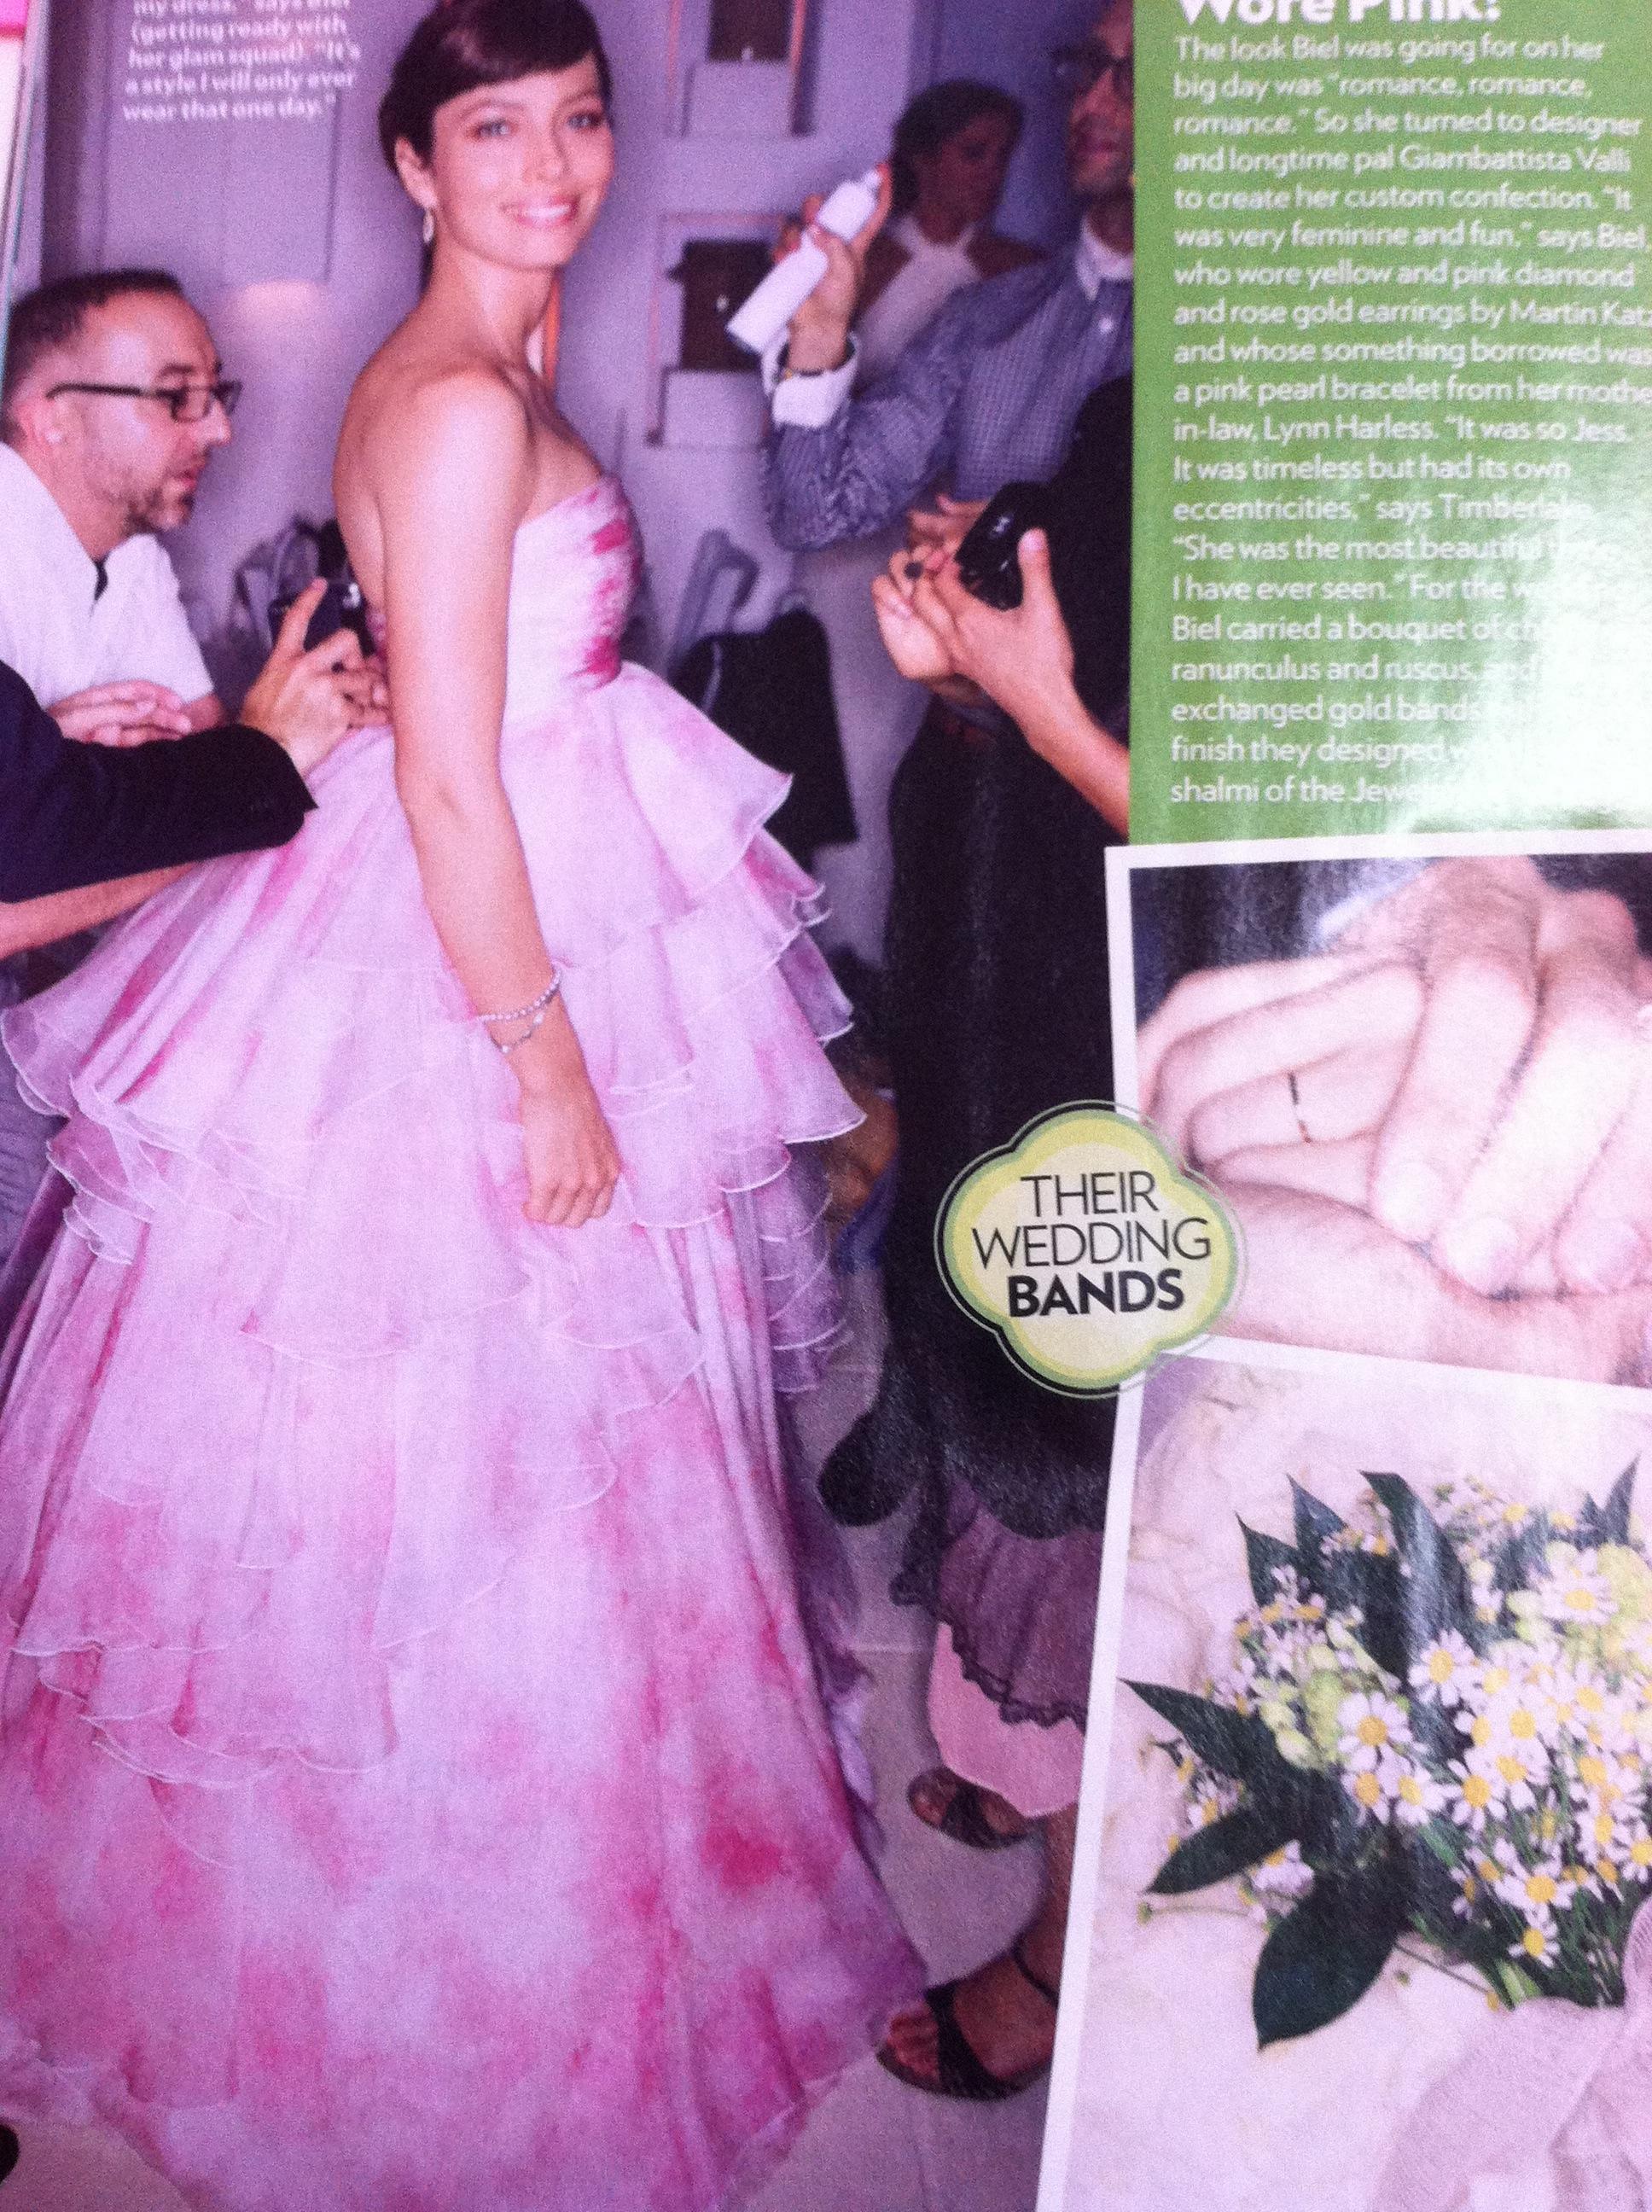 Bridal Blush - Style Files